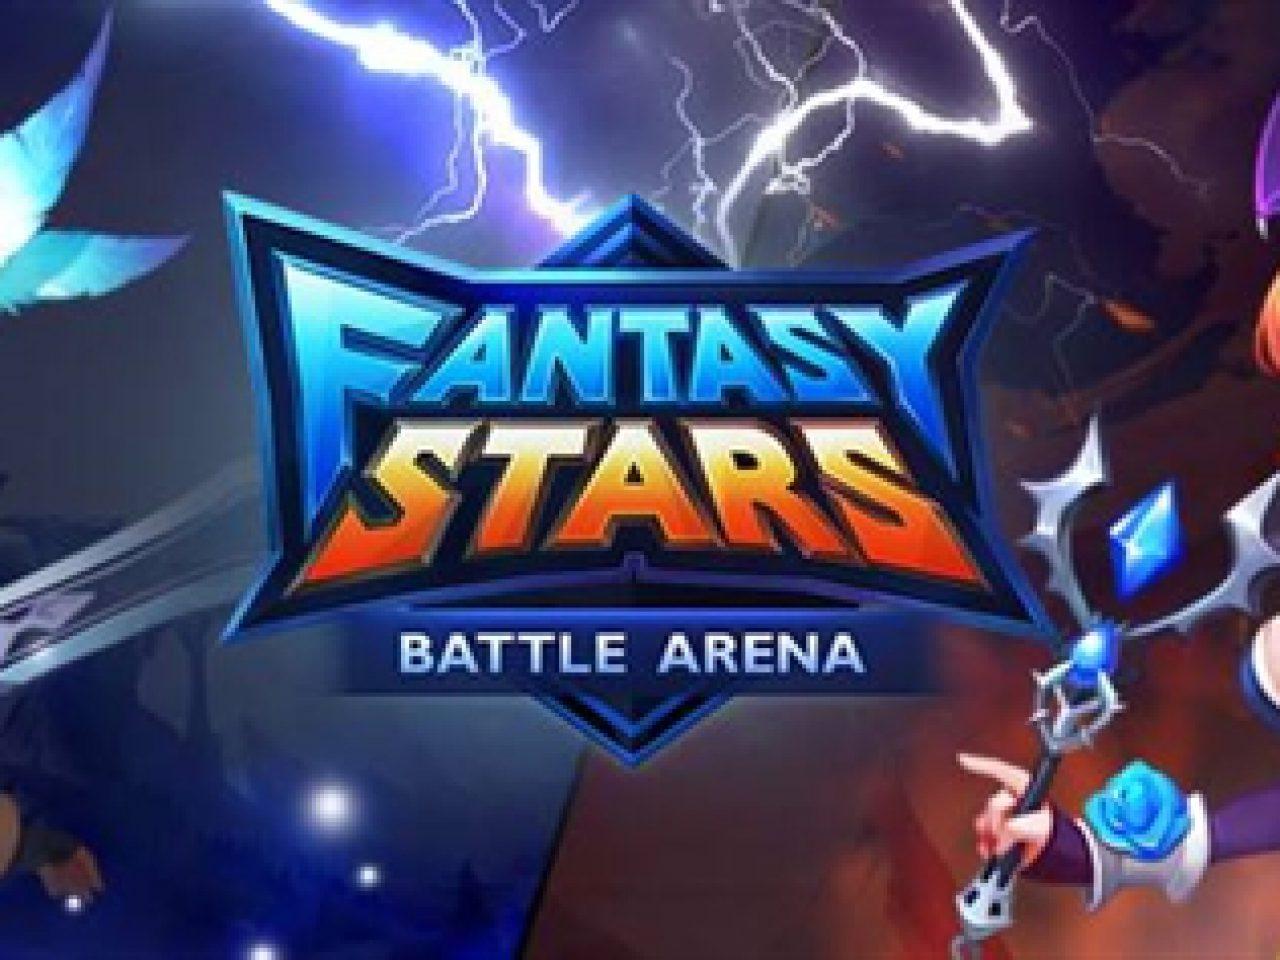 Fantasy Stars Battle Arena